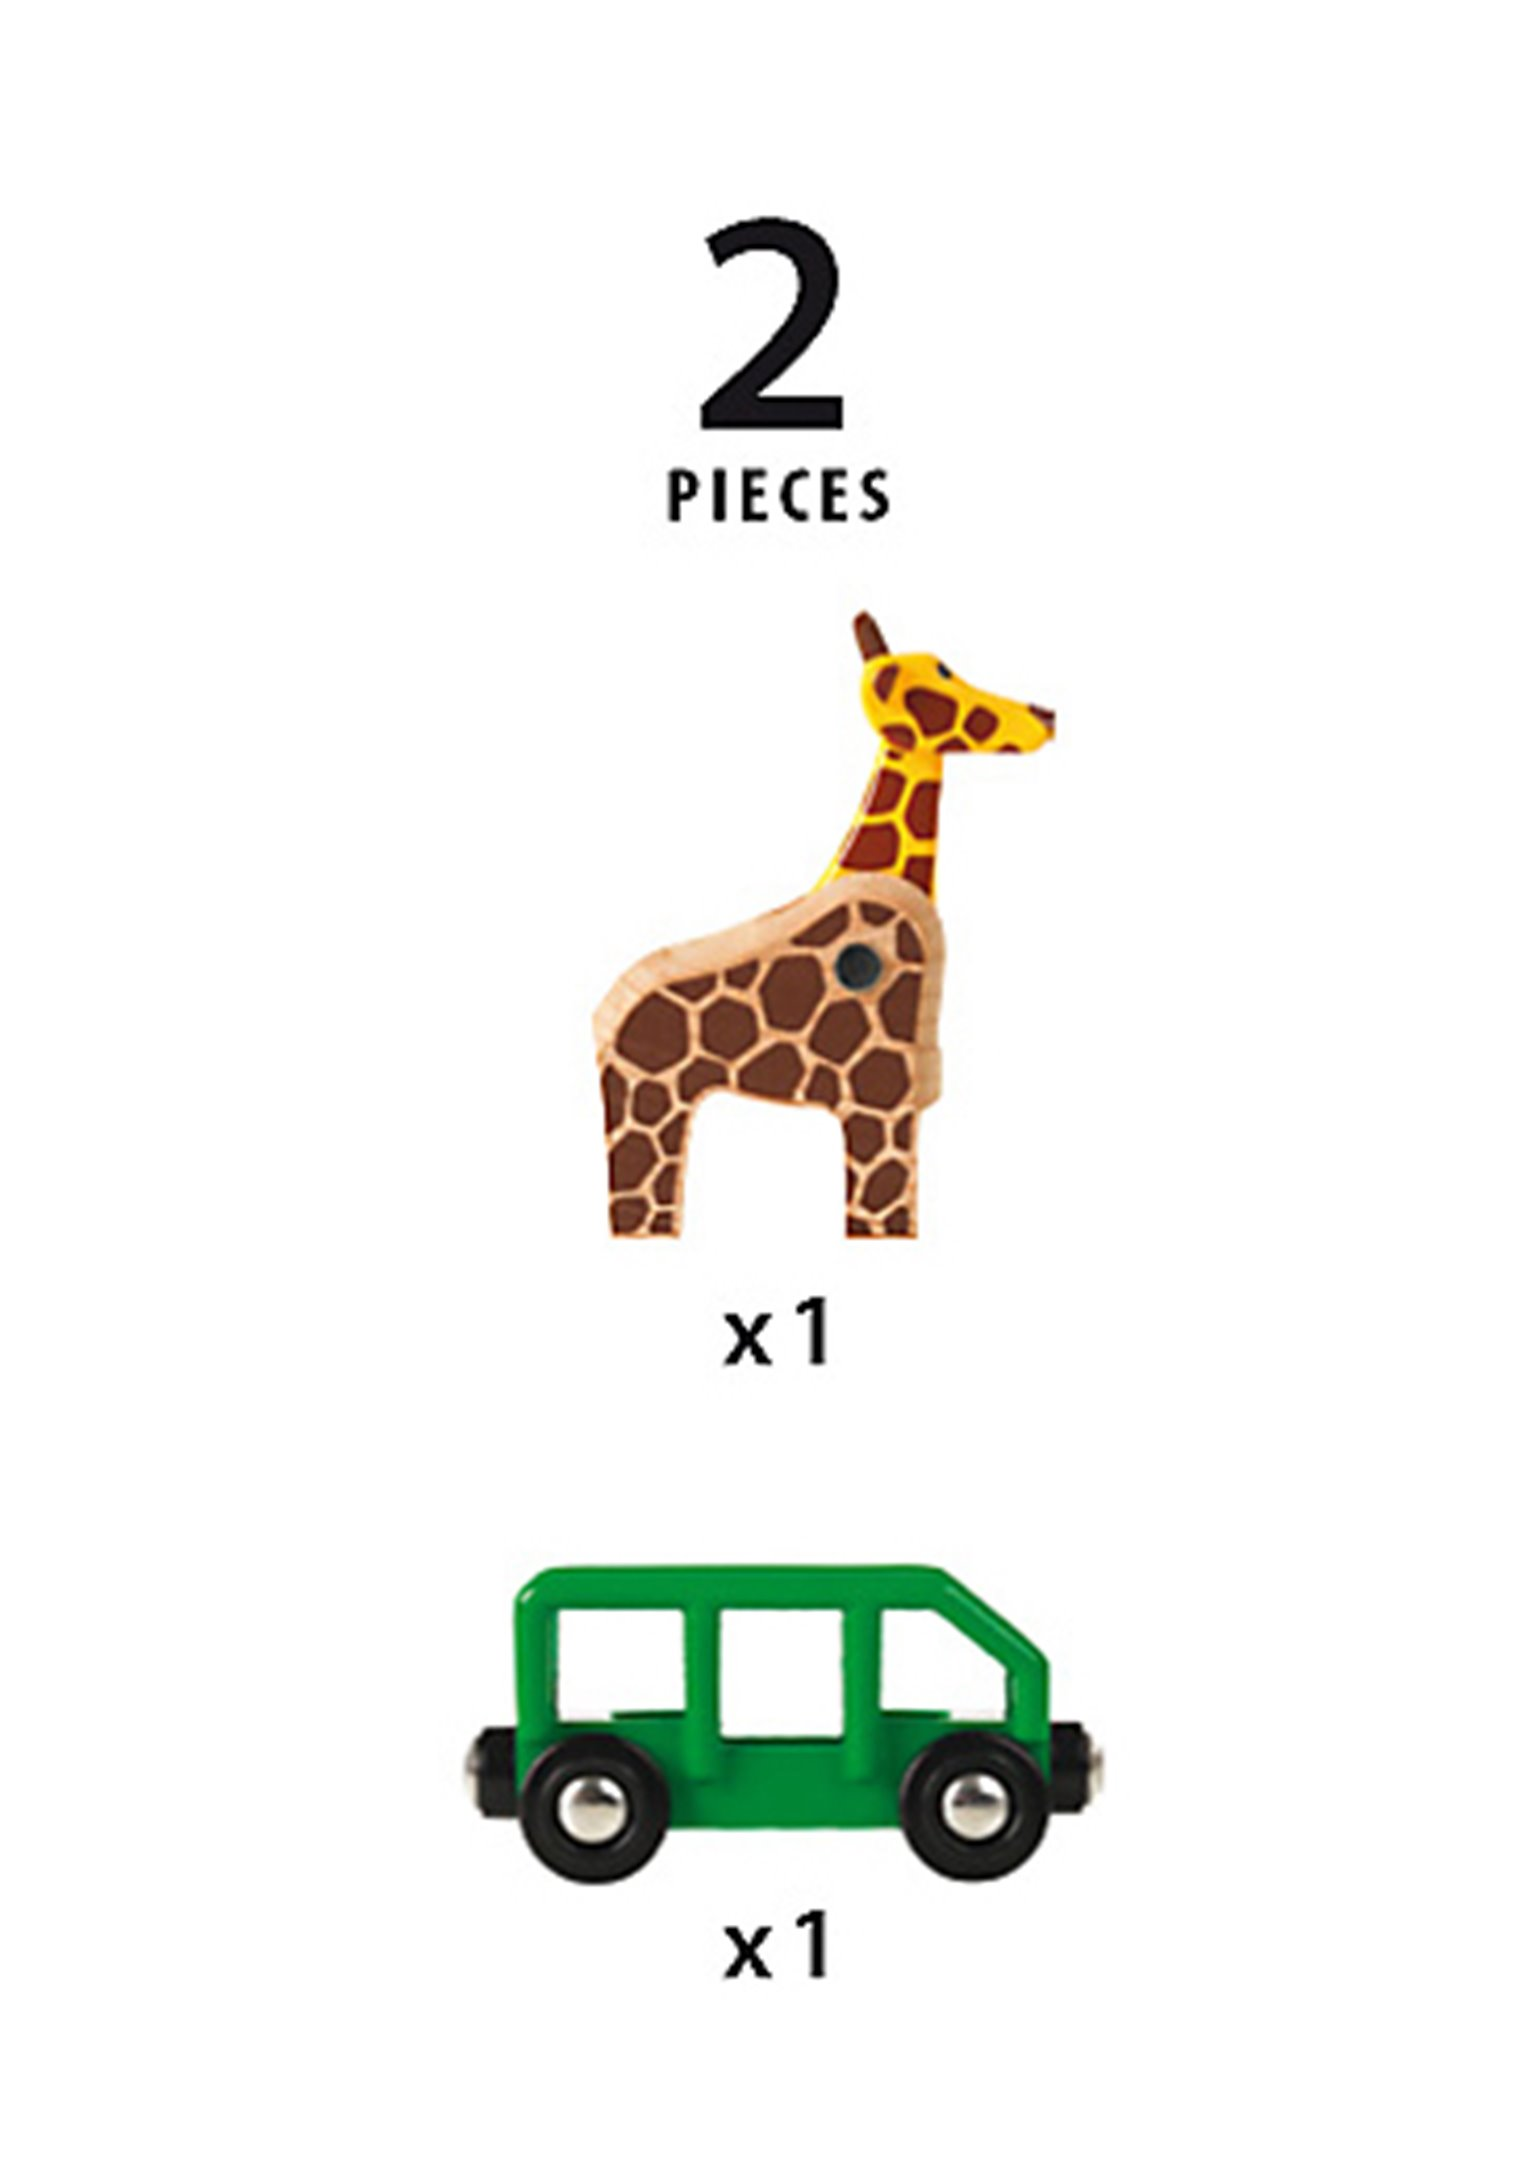 BRIO WORLD - Giraffe and Wagon for Railway